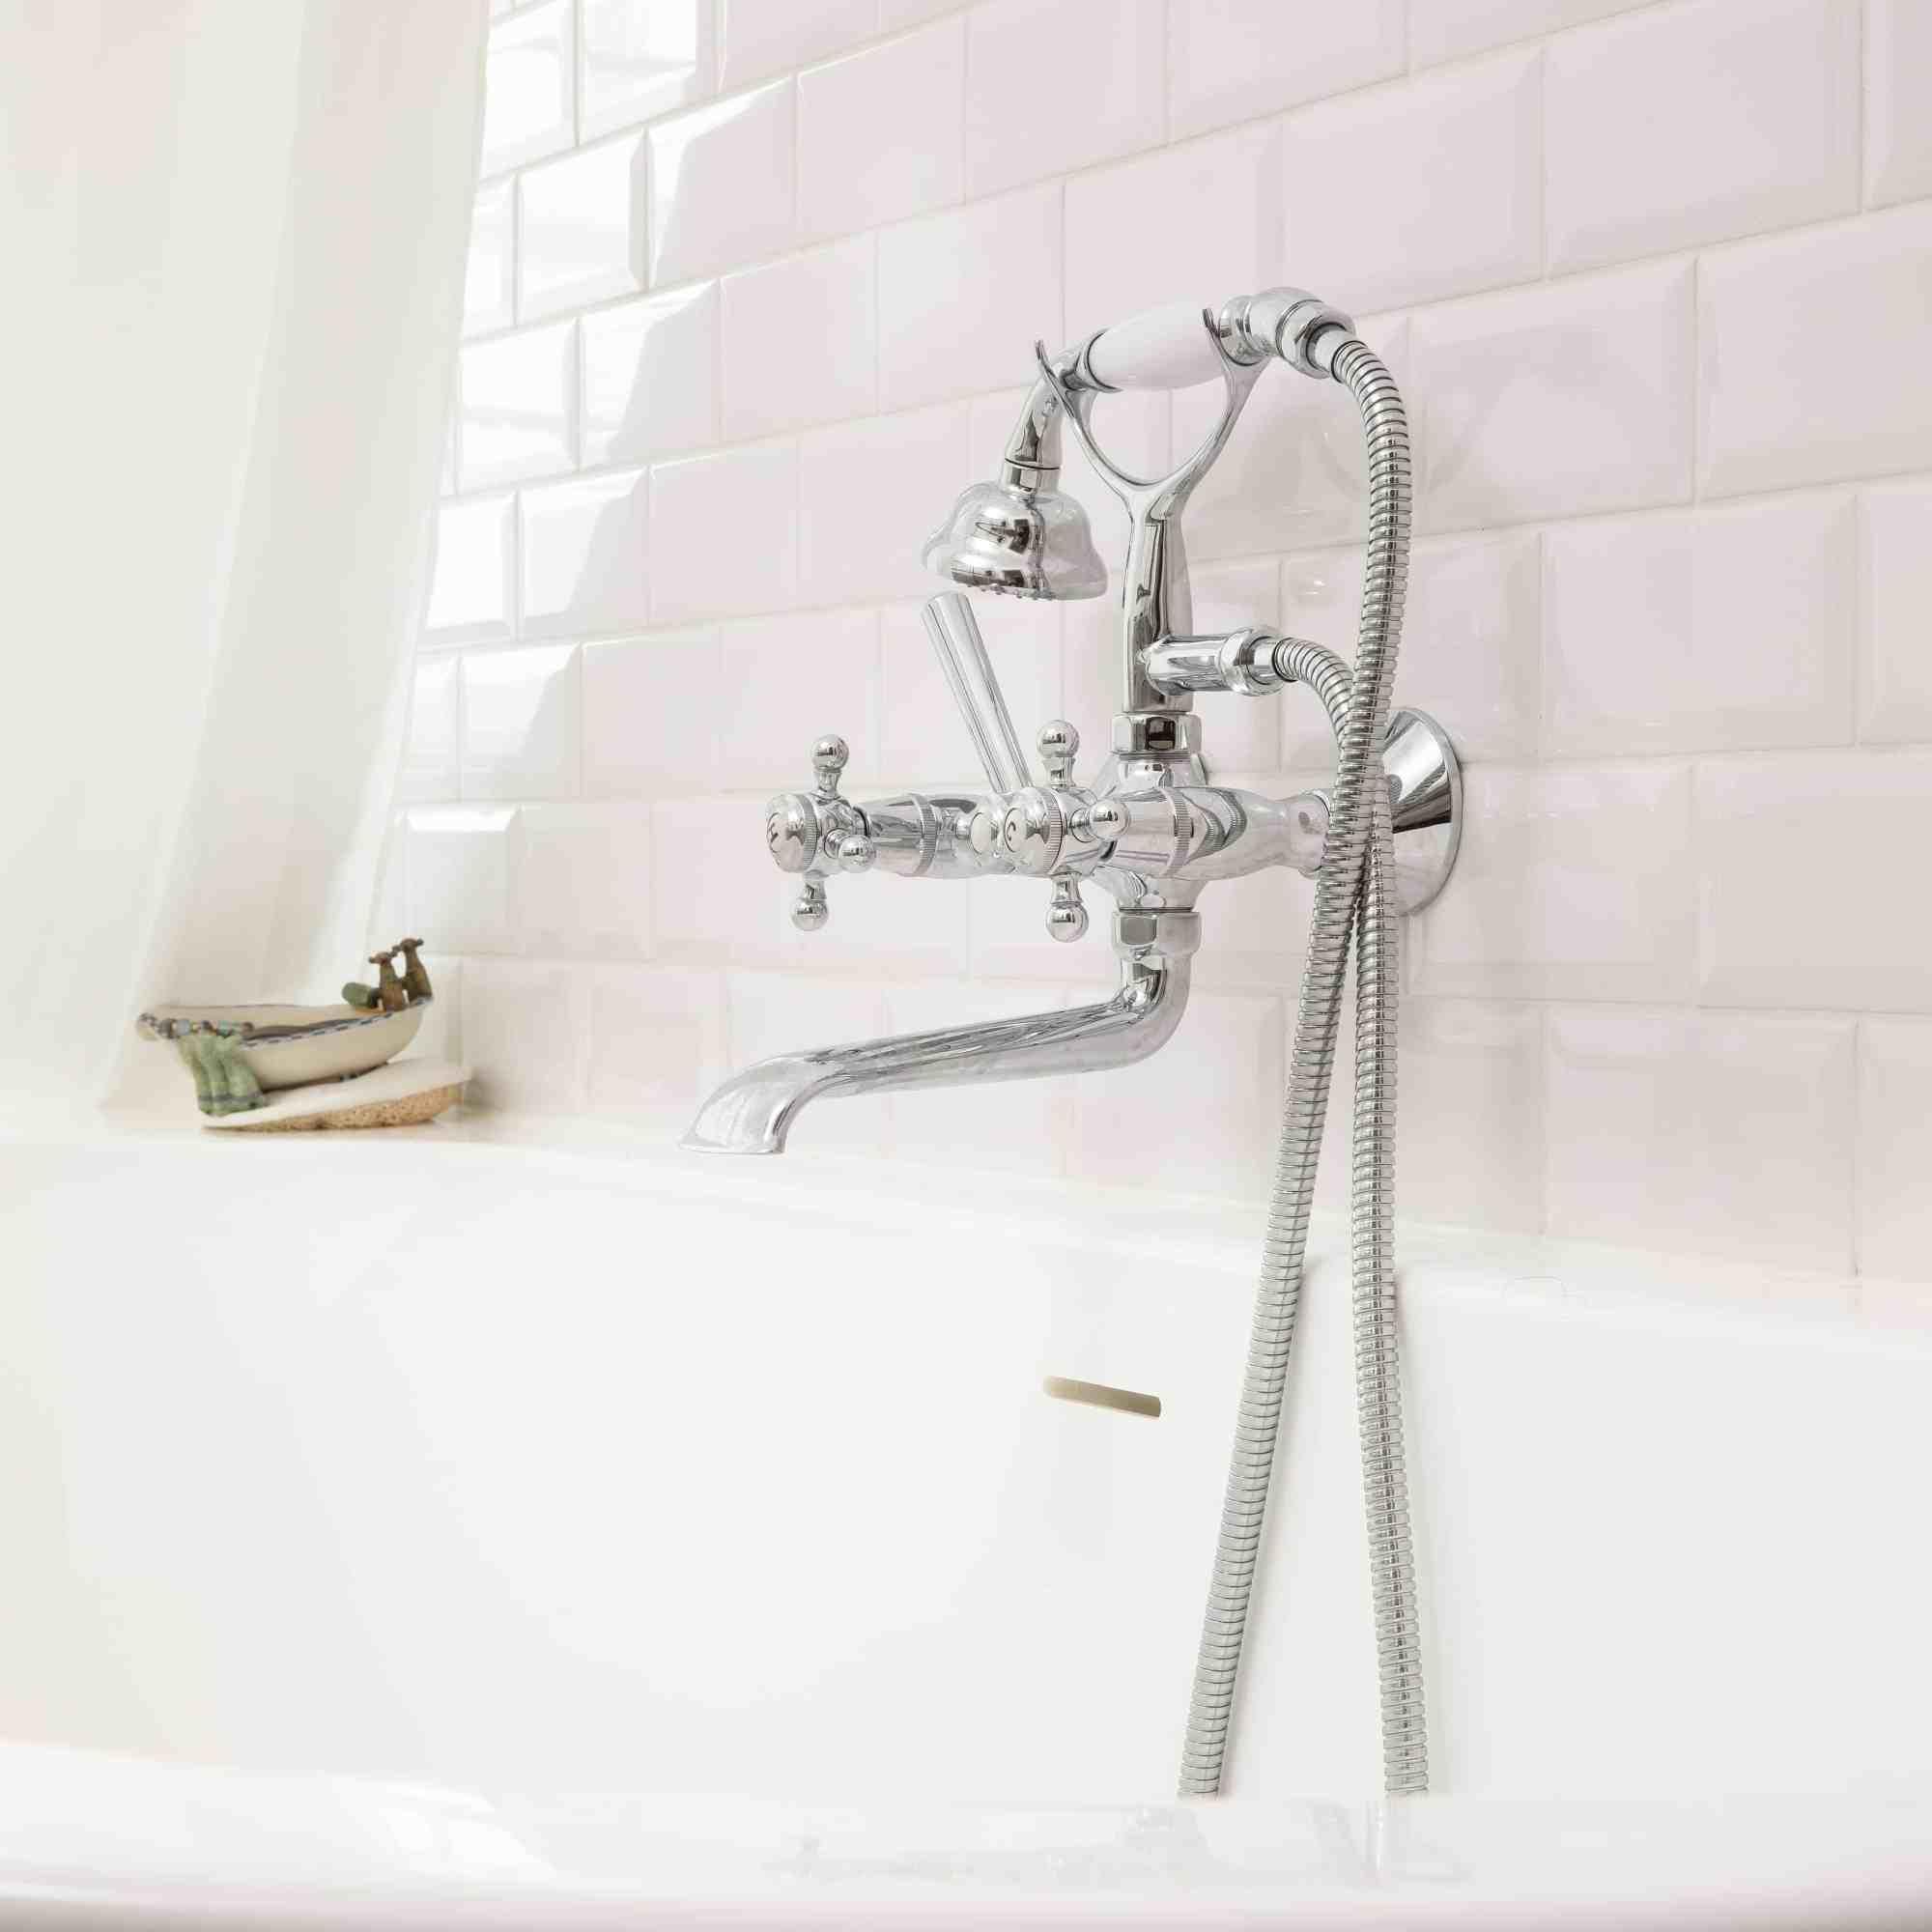 Stijlvolle badkamer, badkuip omring door witte kleine wandtegels - Roeselare